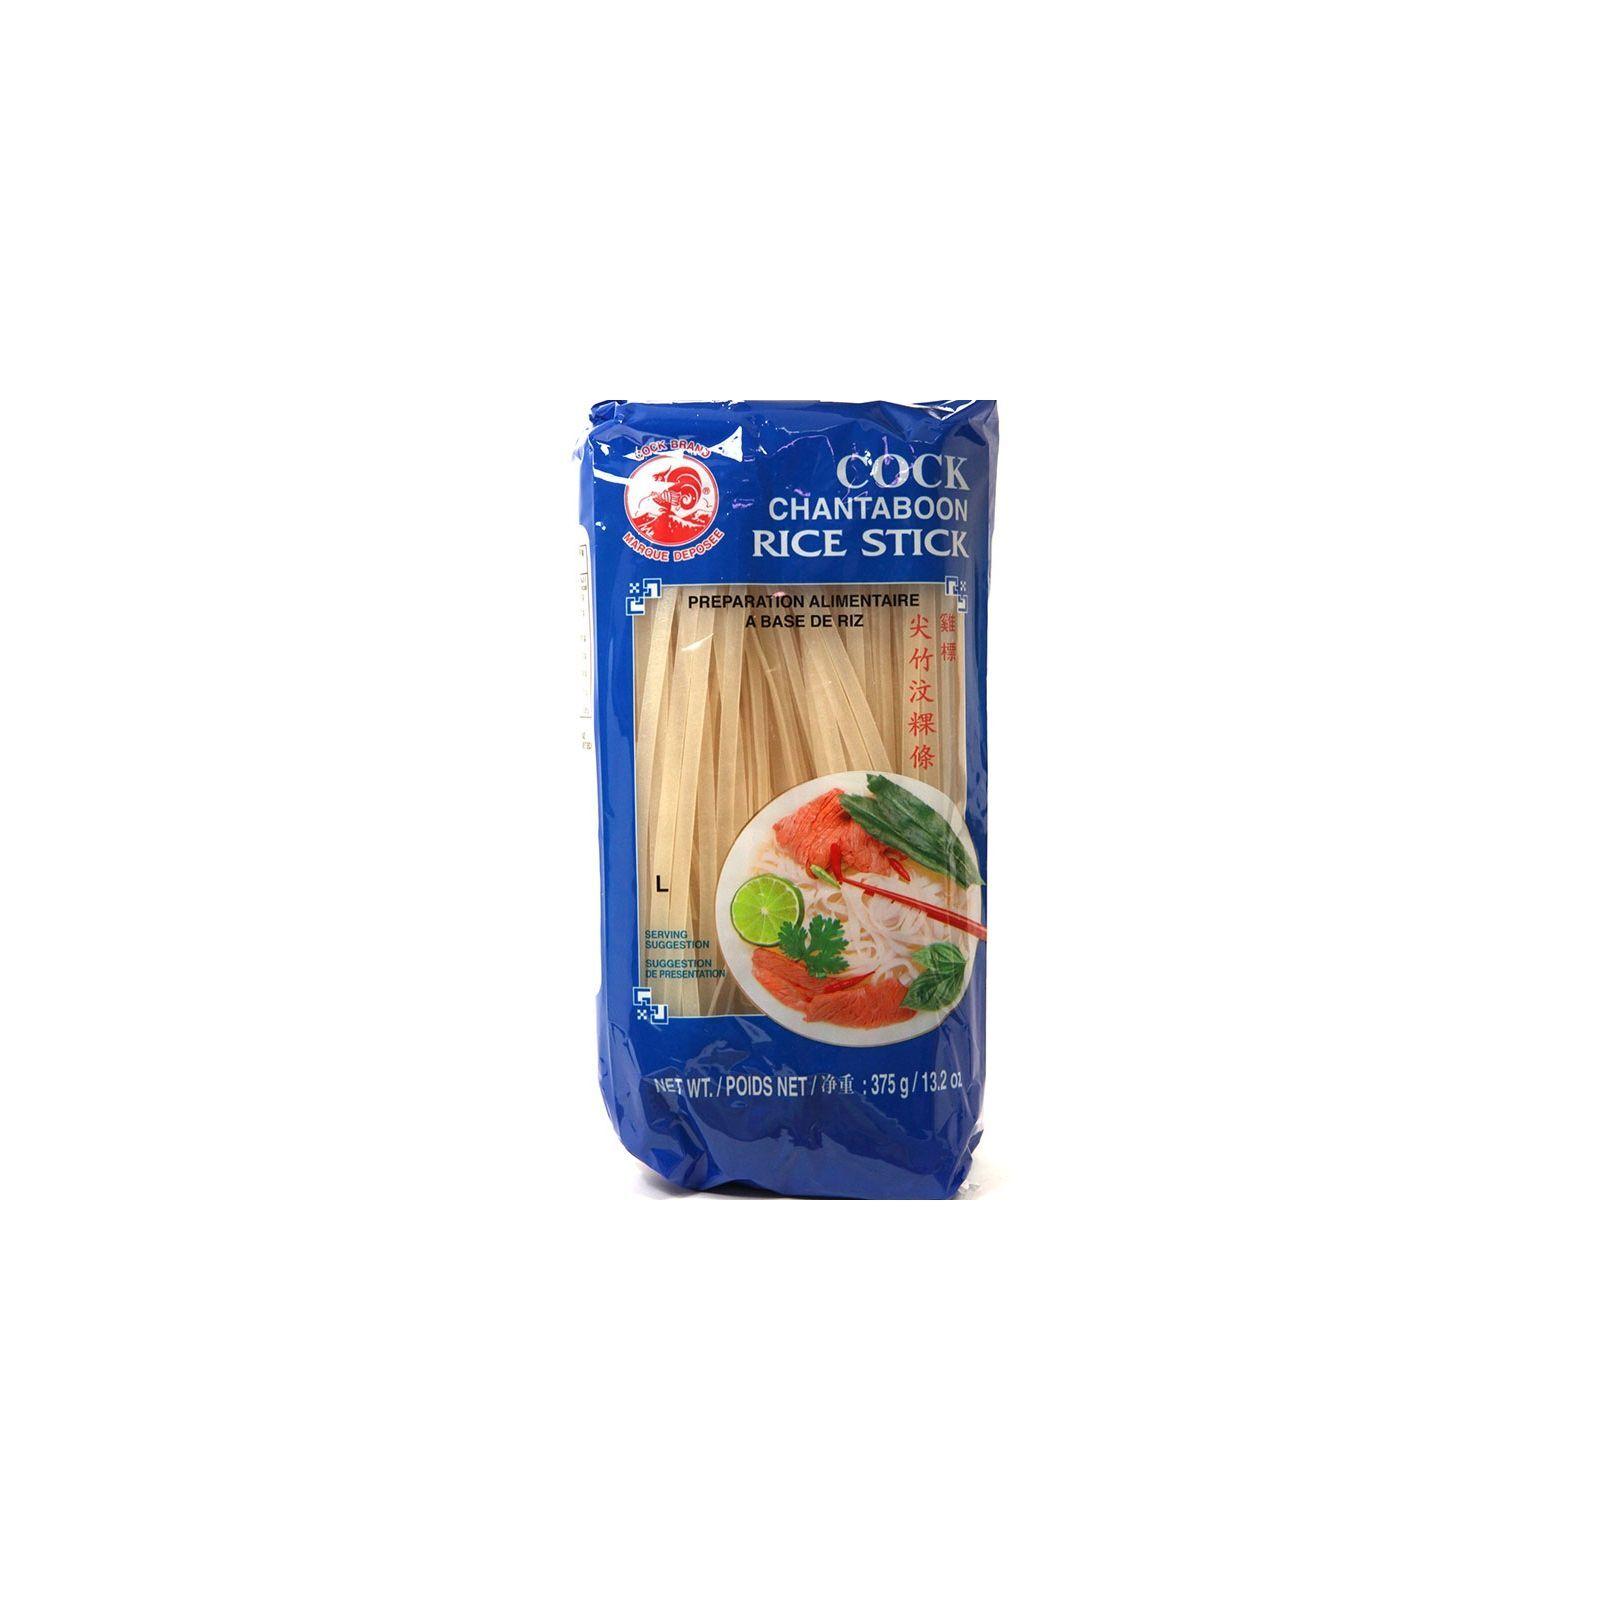 Asia Marché Pâte de riz Chantaboon 375g 1 mm